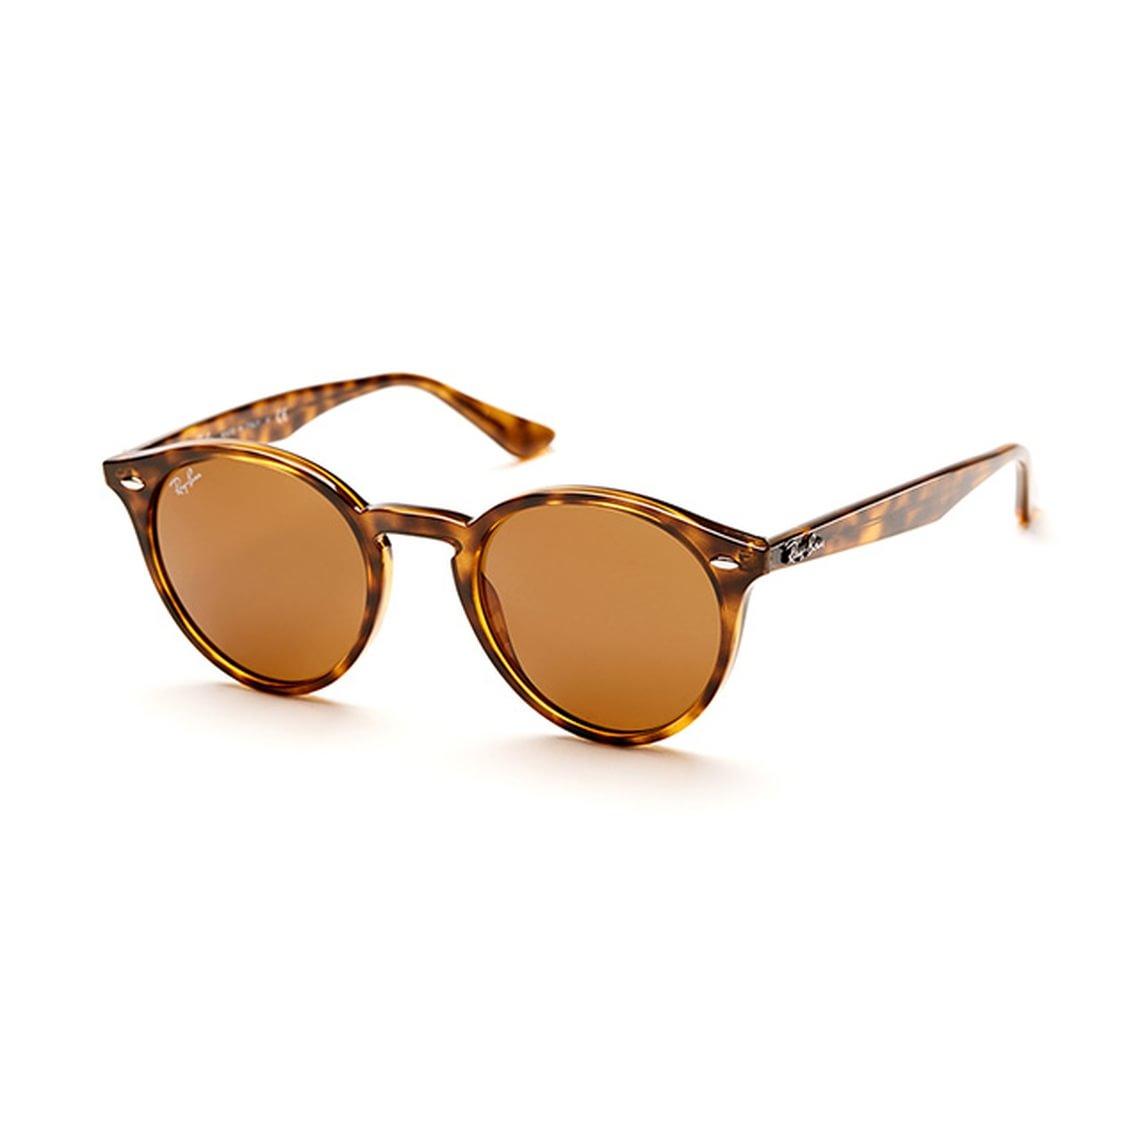 30688bd3cfc1c0 Ray-Ban - Solglasögon - Synsam